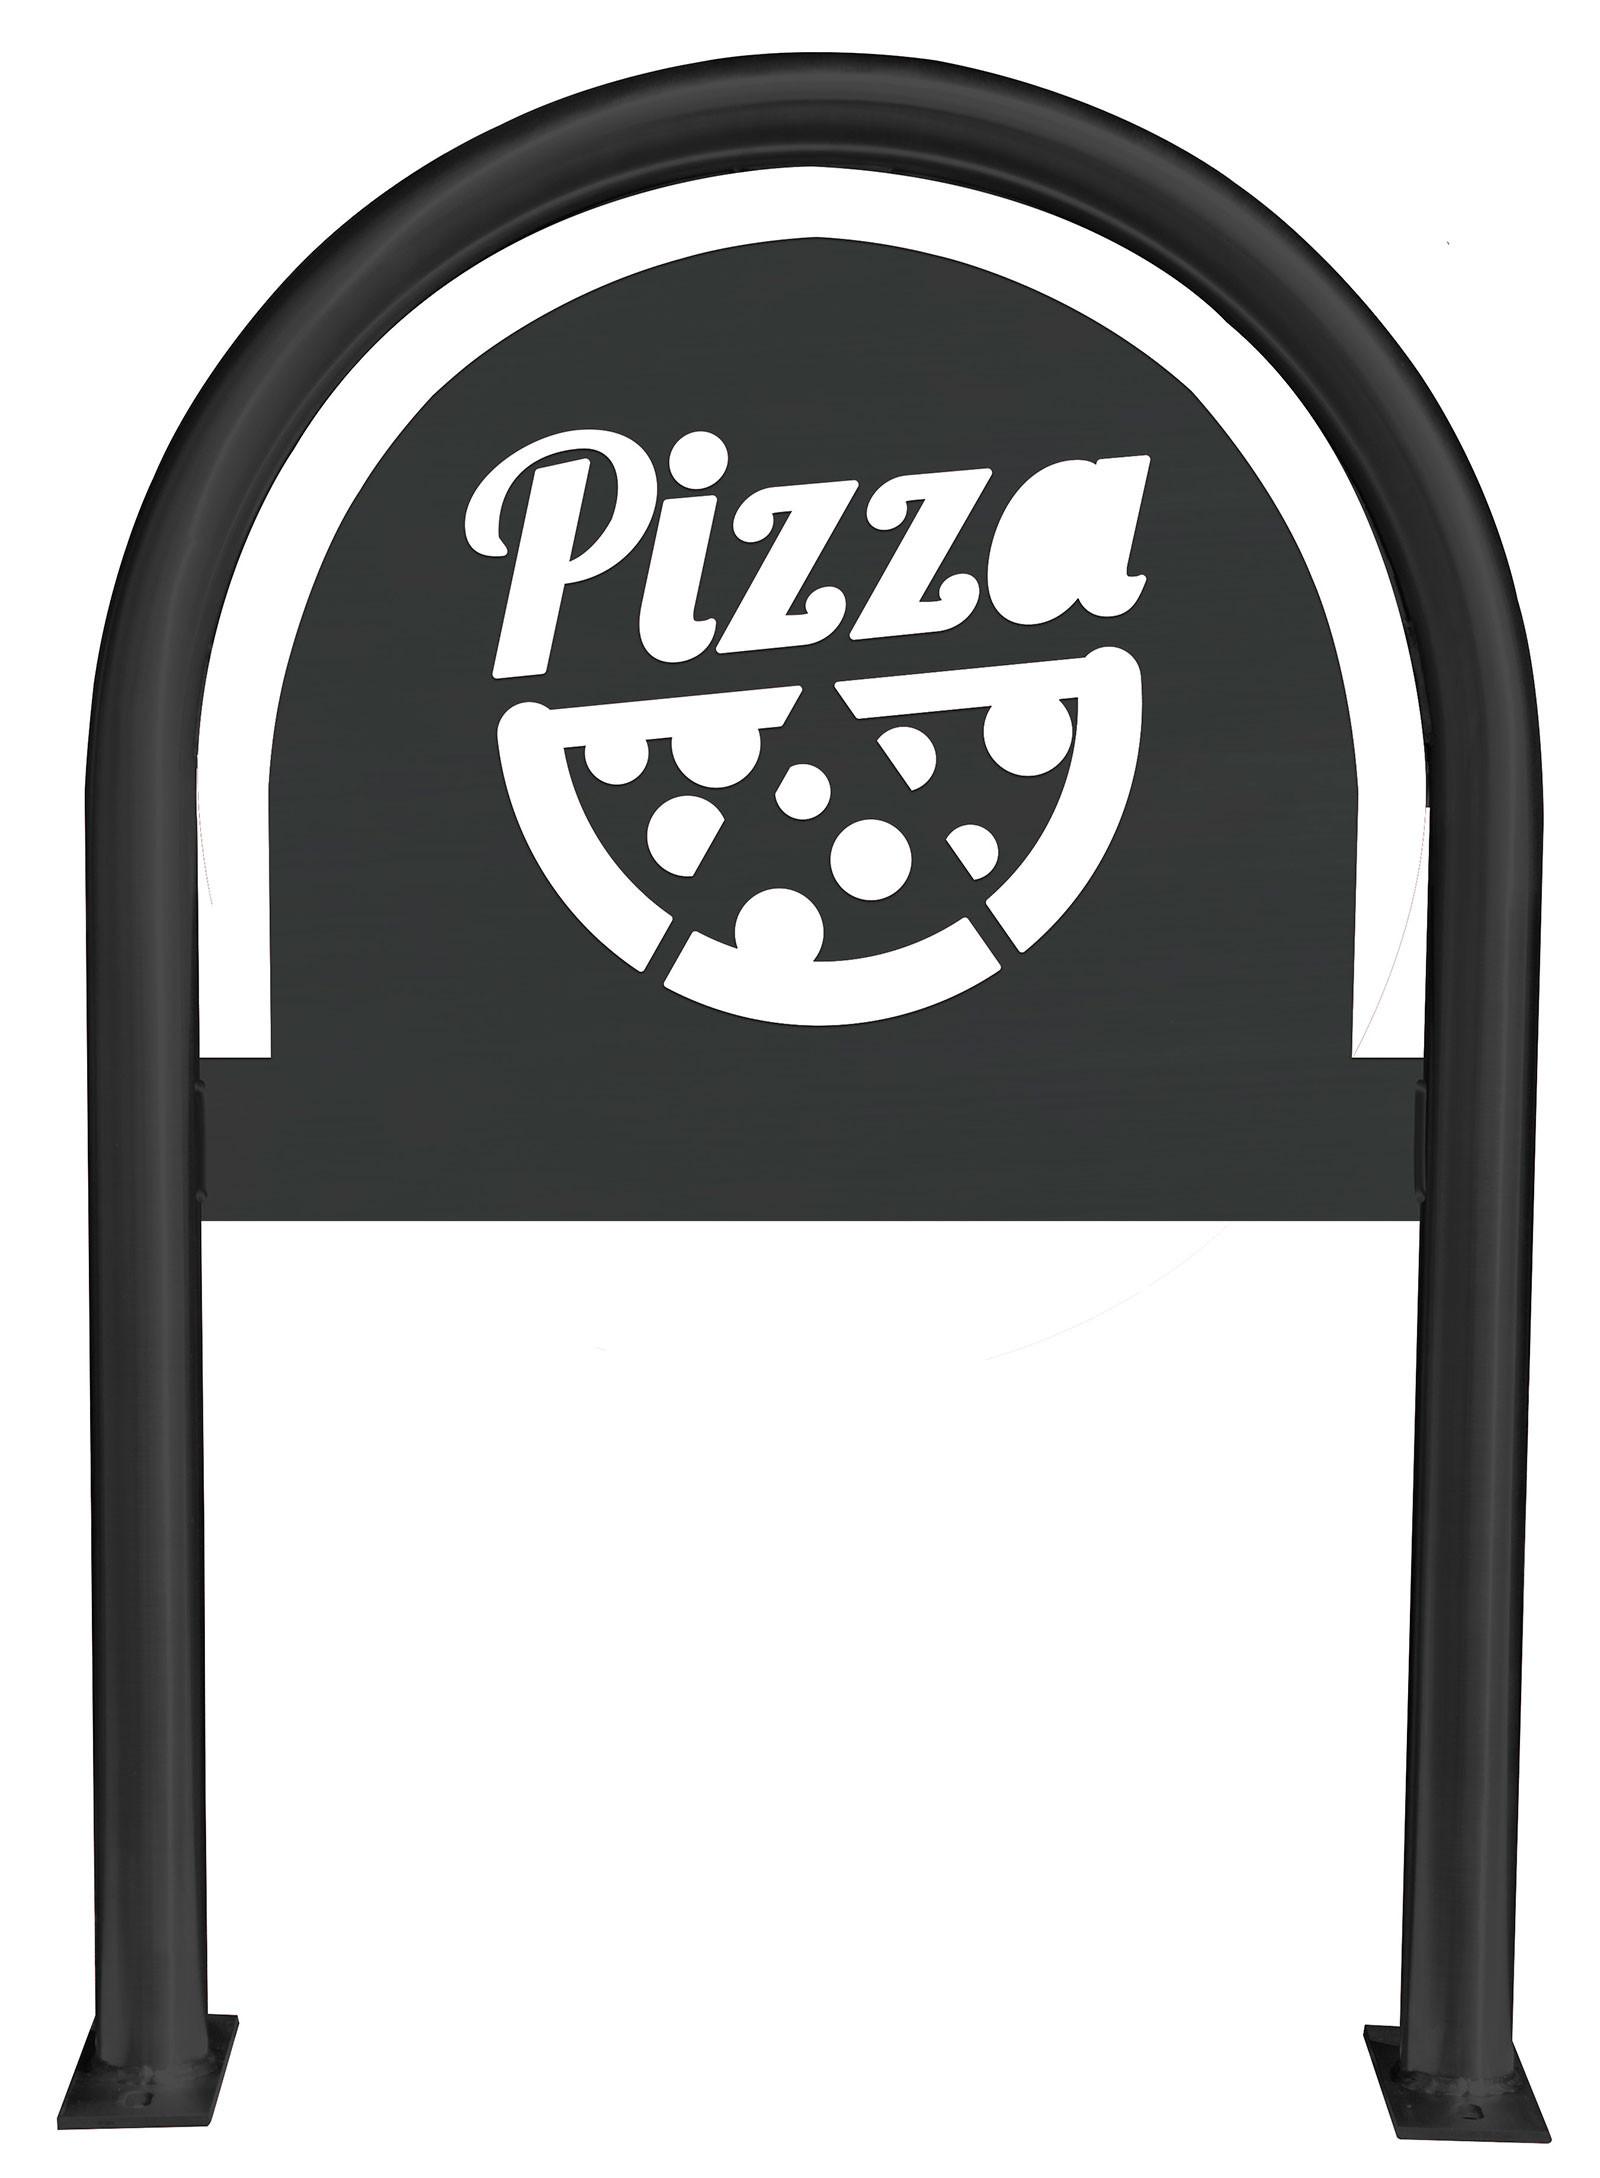 Pizza Slice Laser Cut Panel Themed Bike Rack